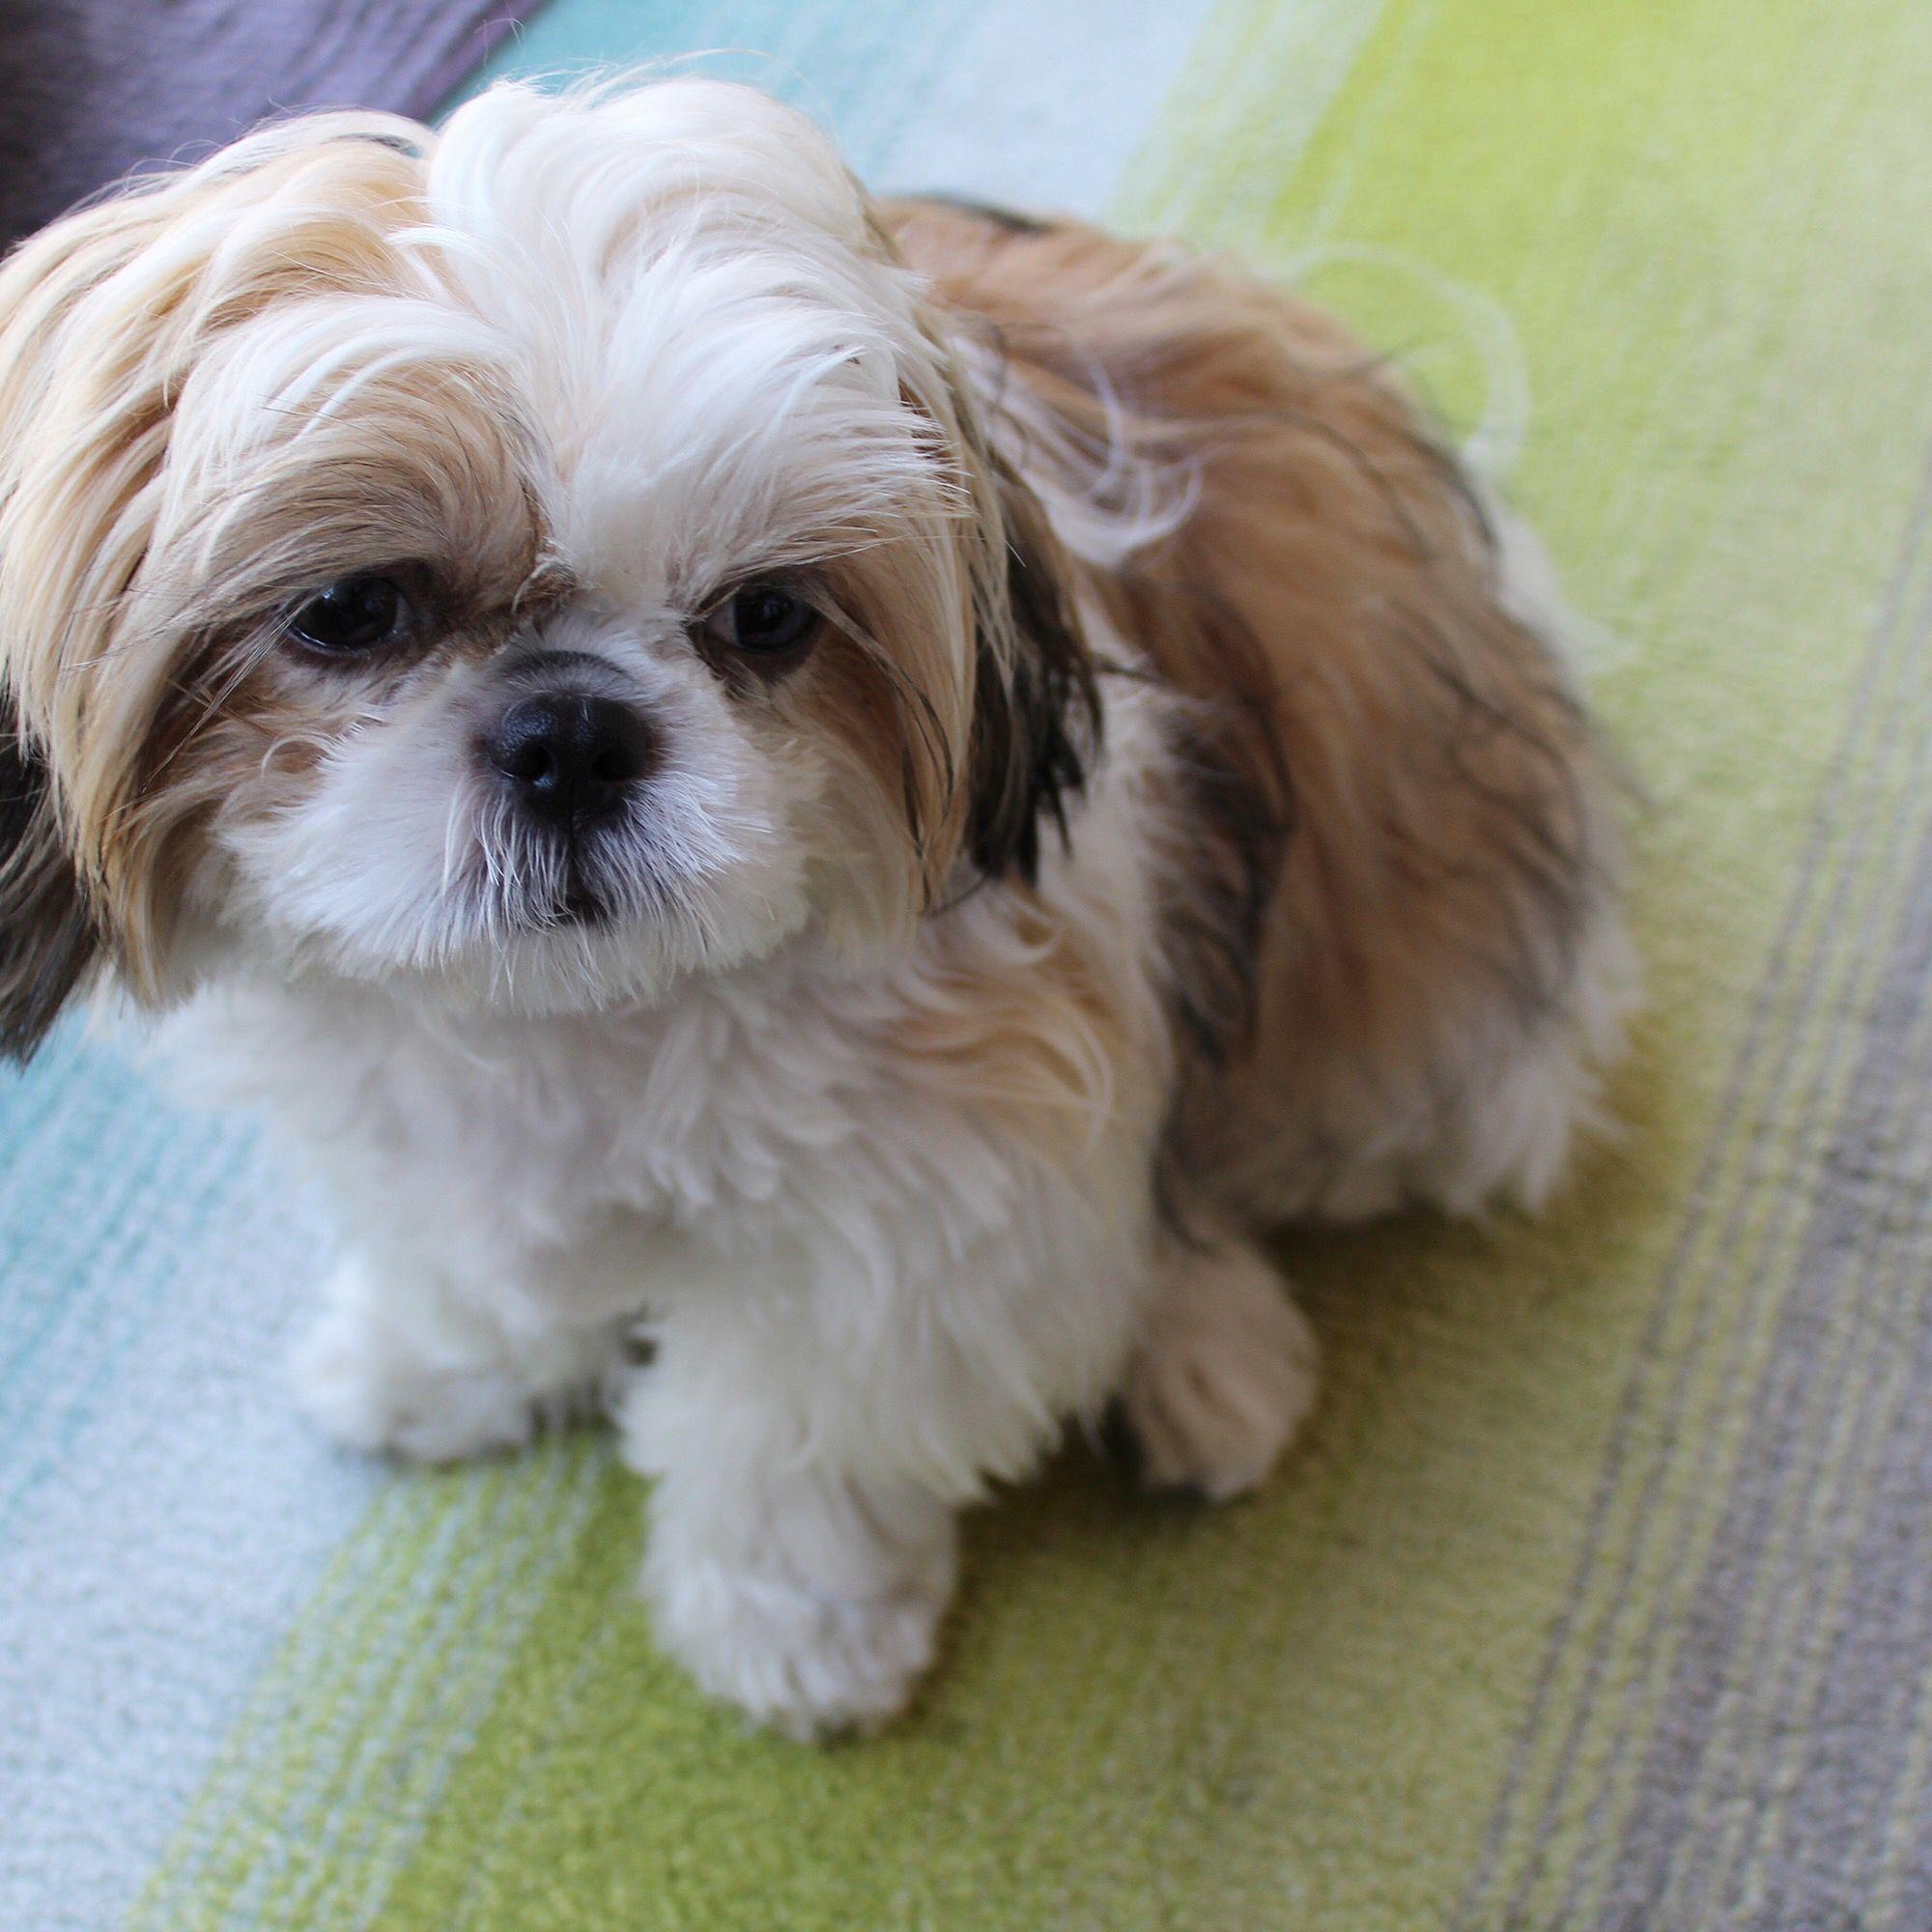 My Cutest Little Girl Foxiepup Shih Tzu Puppy Shih Tzu Puppies